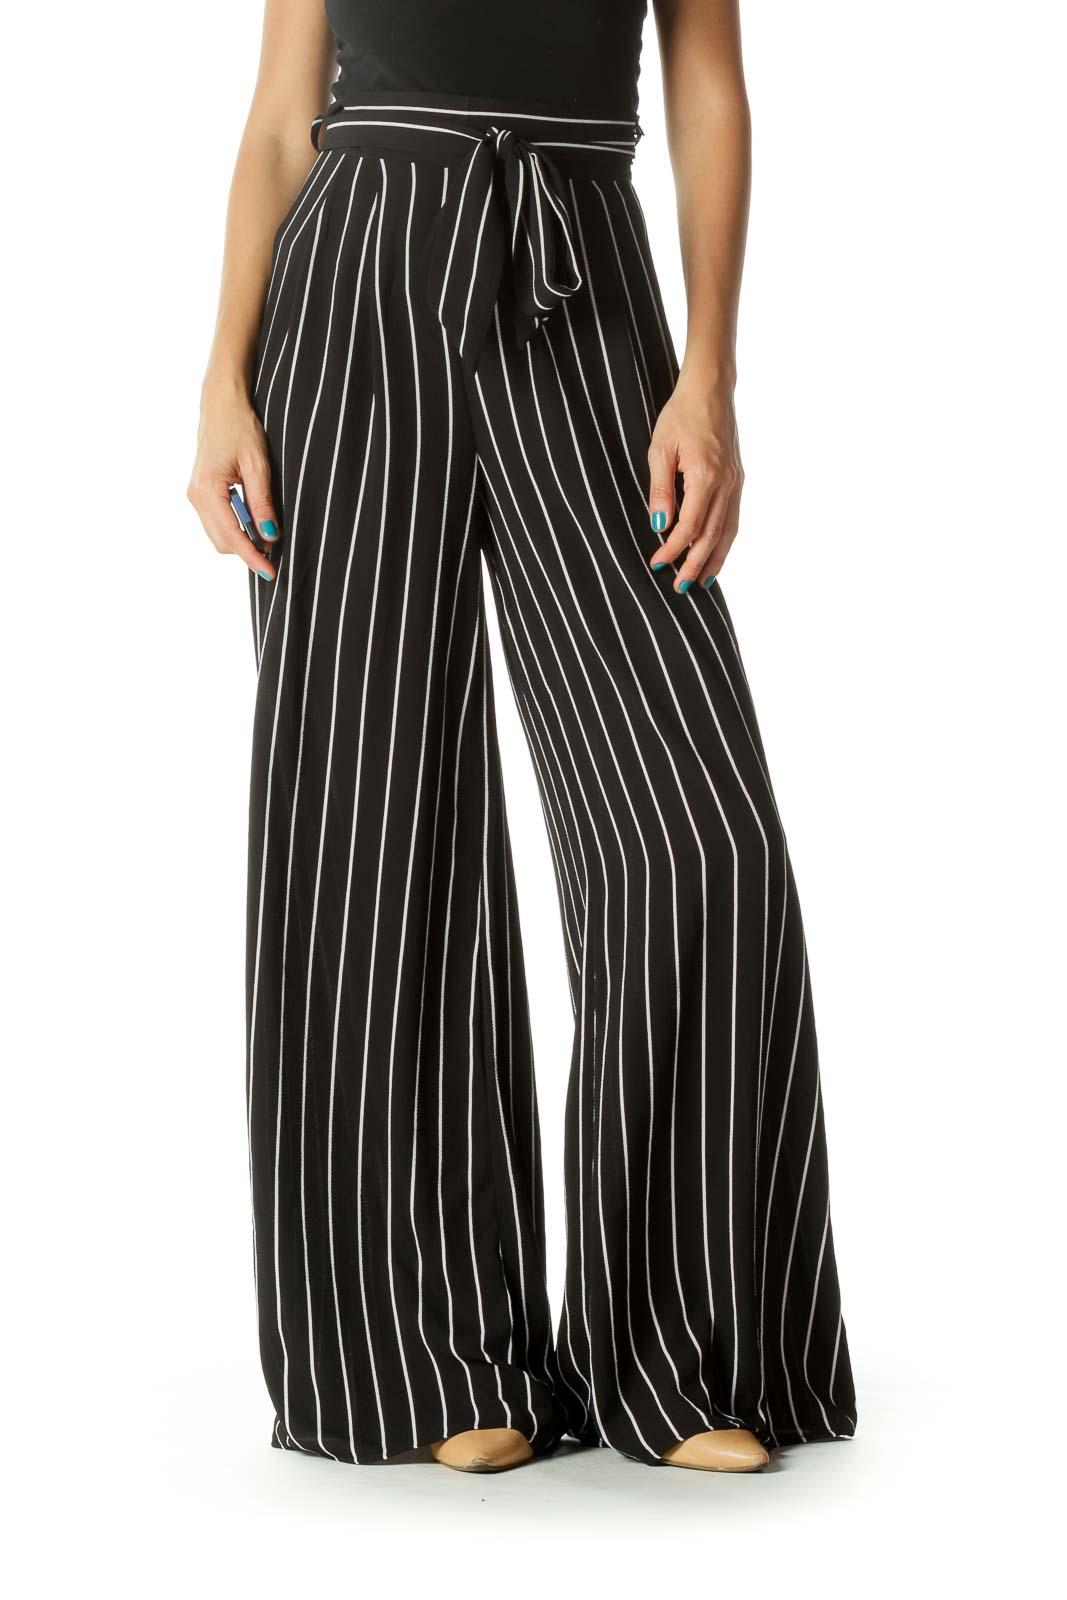 Black & White Waist Tie Zippered Wide-Leg Pants Front